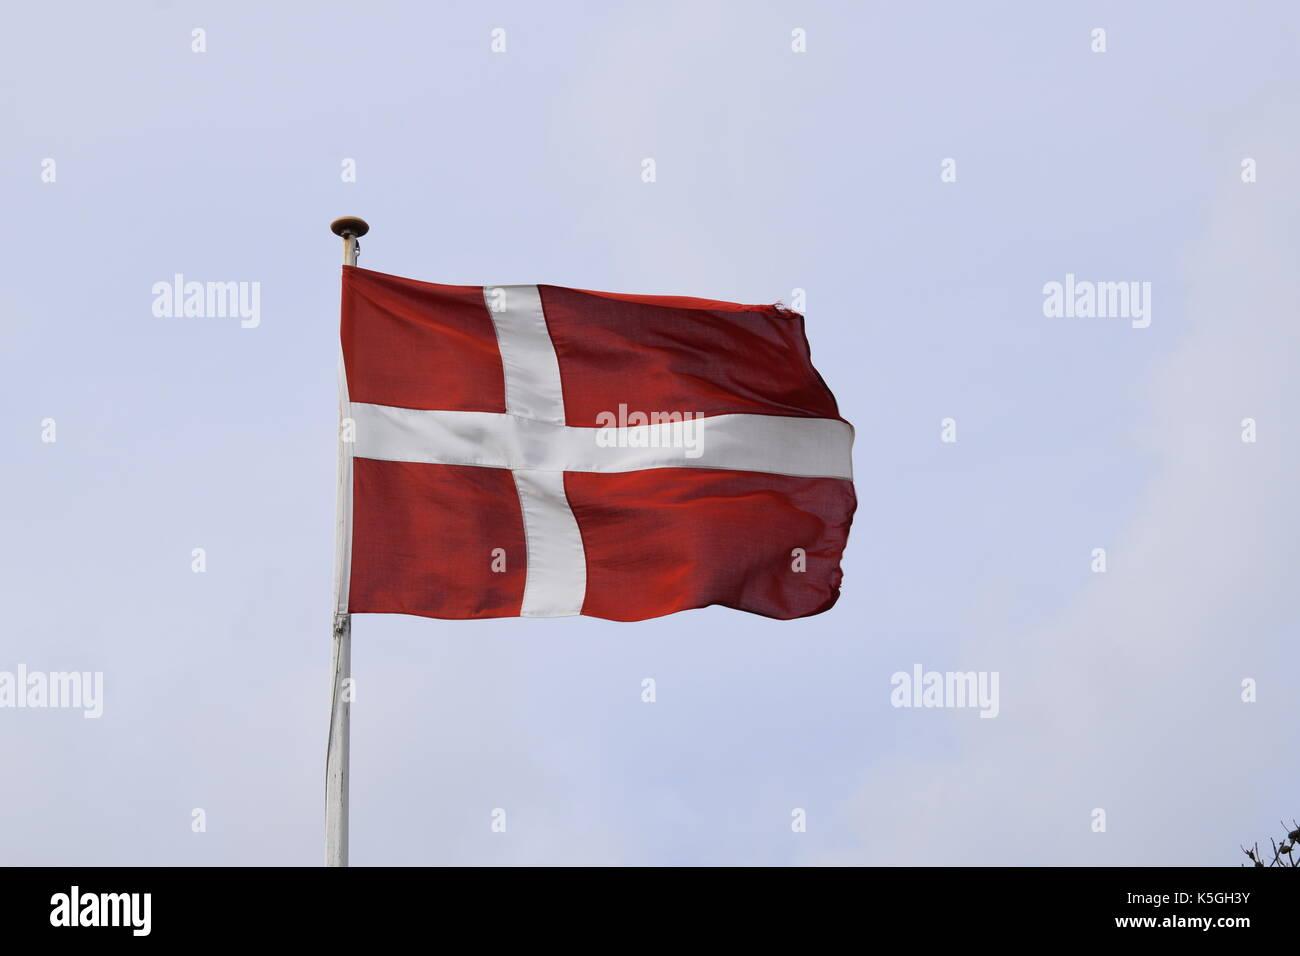 Henne Strand, Denmark. 16th Aug, 2017. The Danish flag (Danish: Dannebrog) flies in Henne Strand, Denmark, 16 August 2017. NO WIRE SERVICE. Photo: Tim Brakemeier/dpa-Zentralbild/ZB/dpa/Alamy Live News - Stock Image